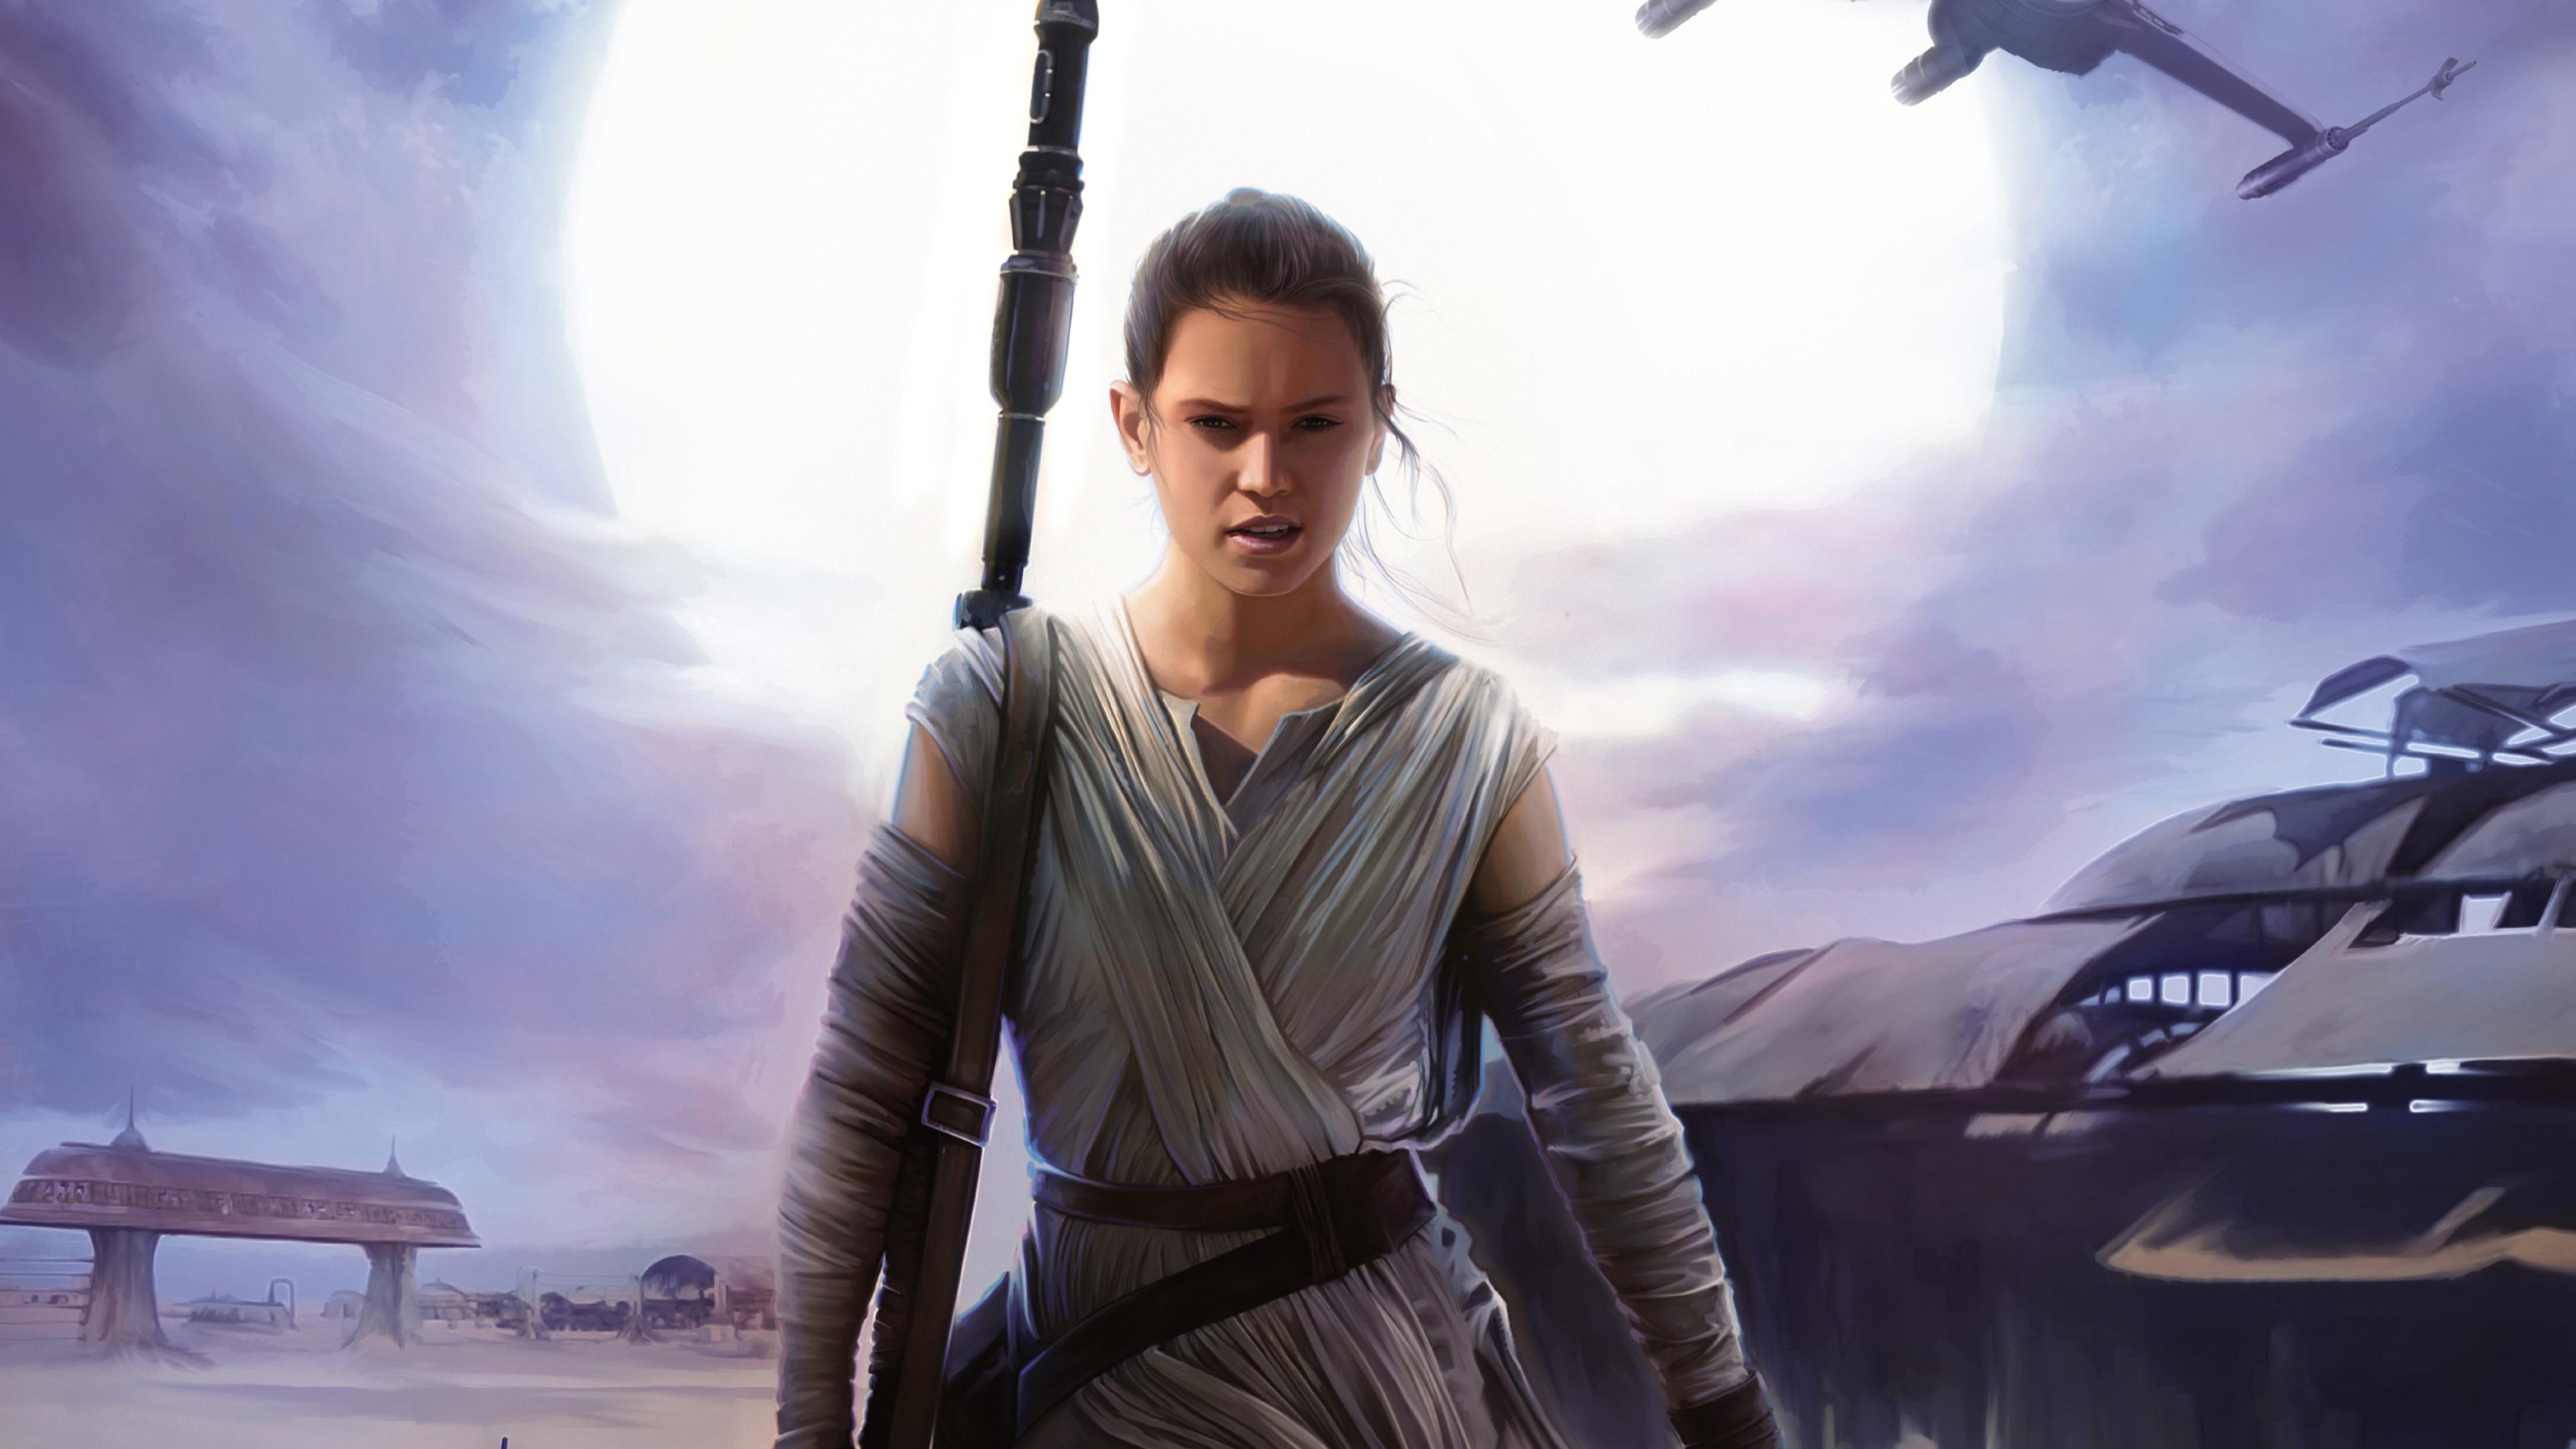 Daisy Ridley Star Wars Wallpaper: 1080x1920 Daisy Ridley Star Wars The Force Awakens Iphone